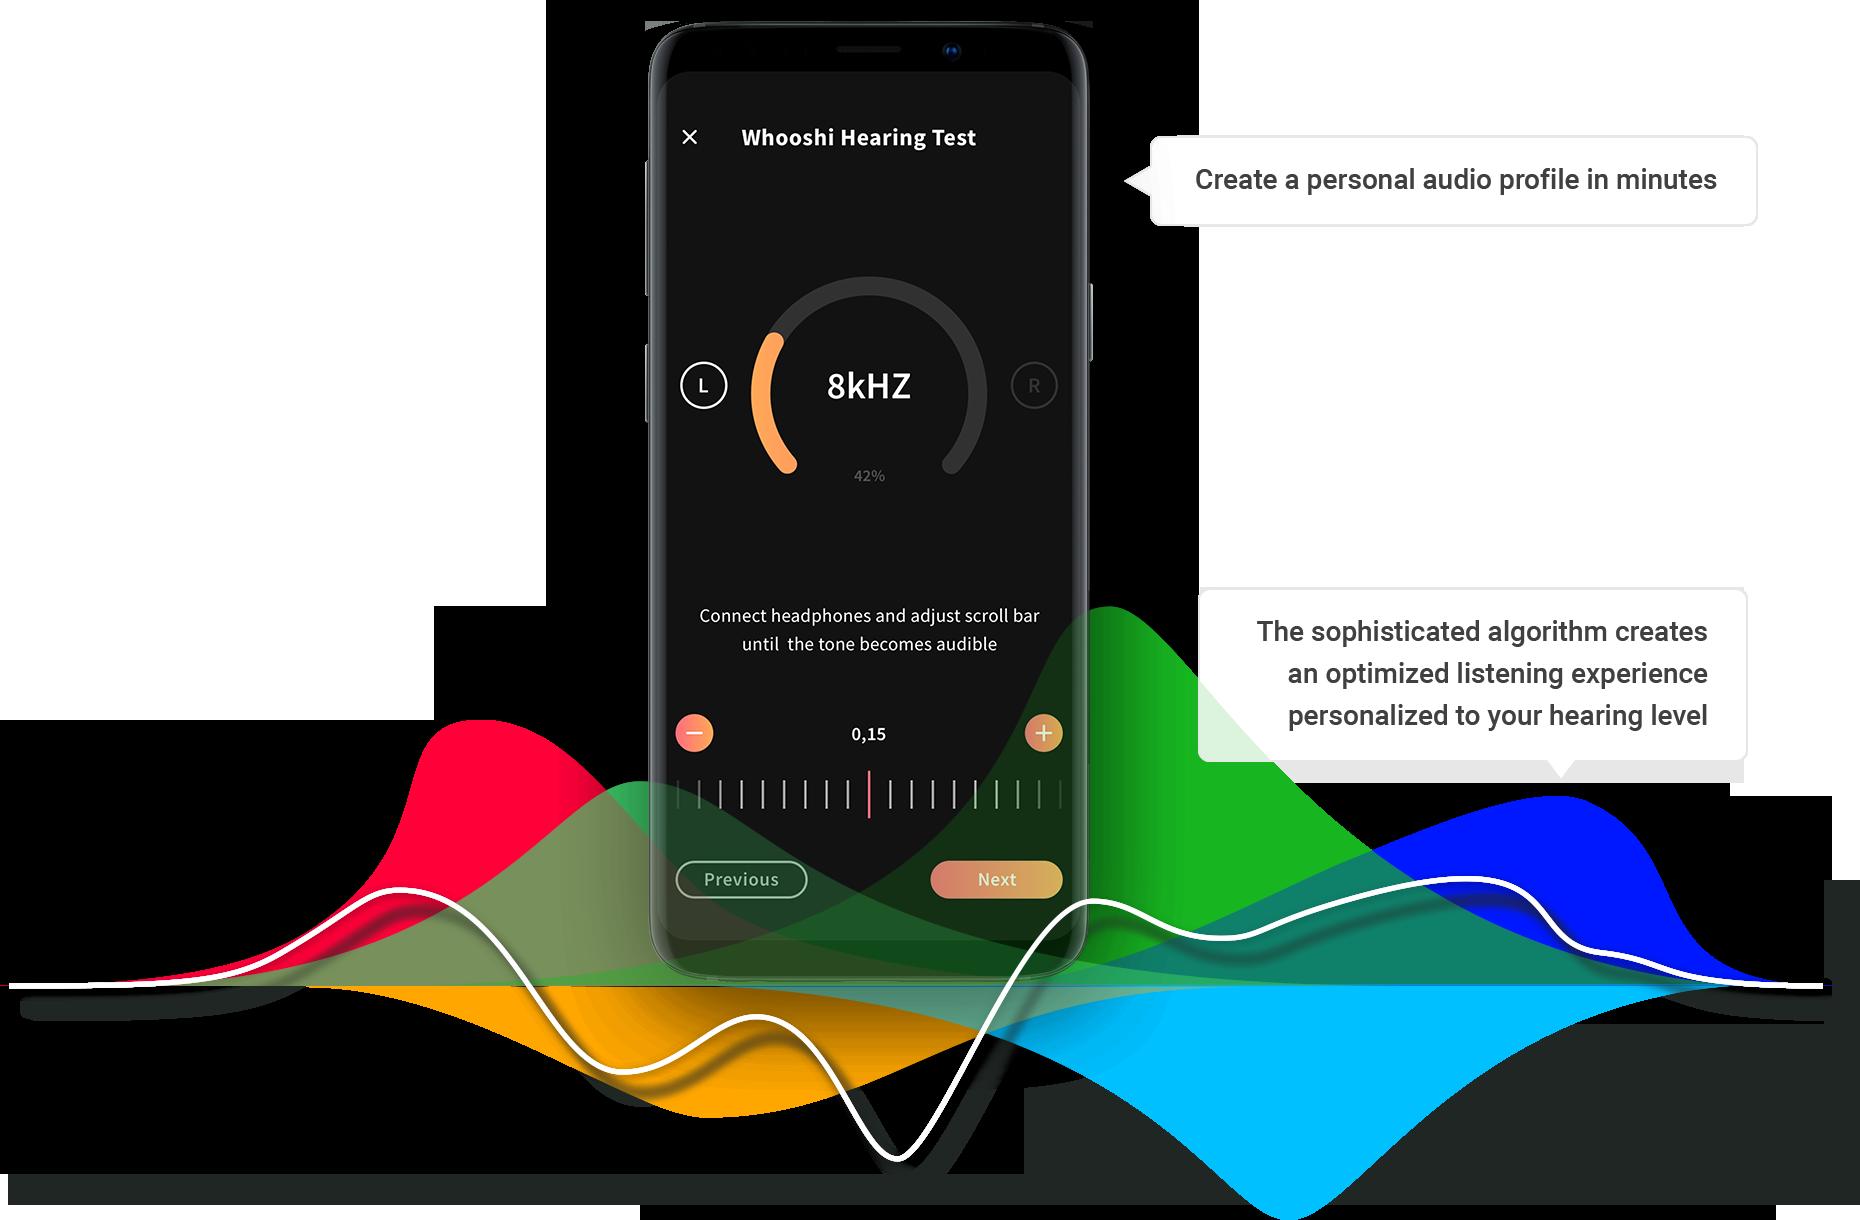 WHOOSHI - Wireless Headphone Amp and Smart Music App